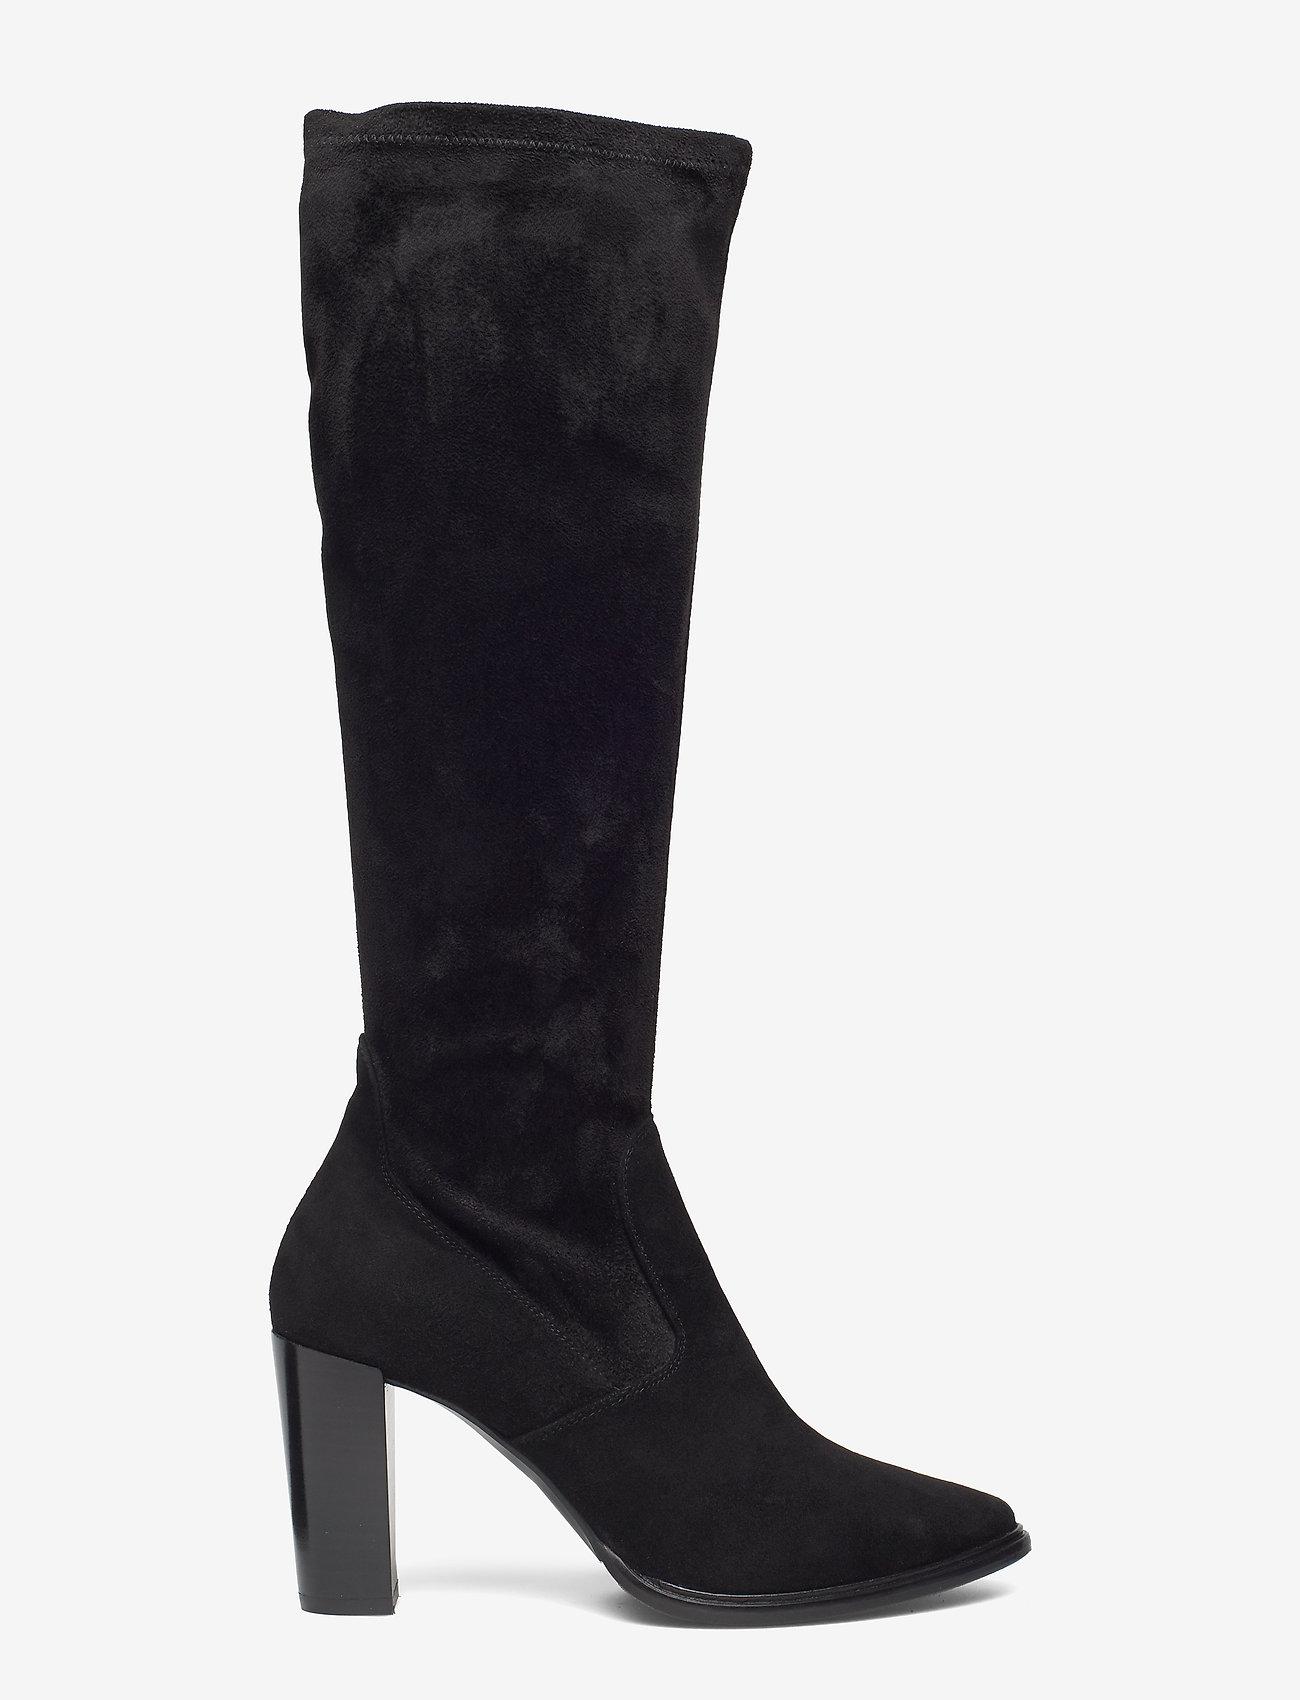 Billi Bi - Long Boots 3396 - pitkävartiset saappaat - black suede/black stretch 500